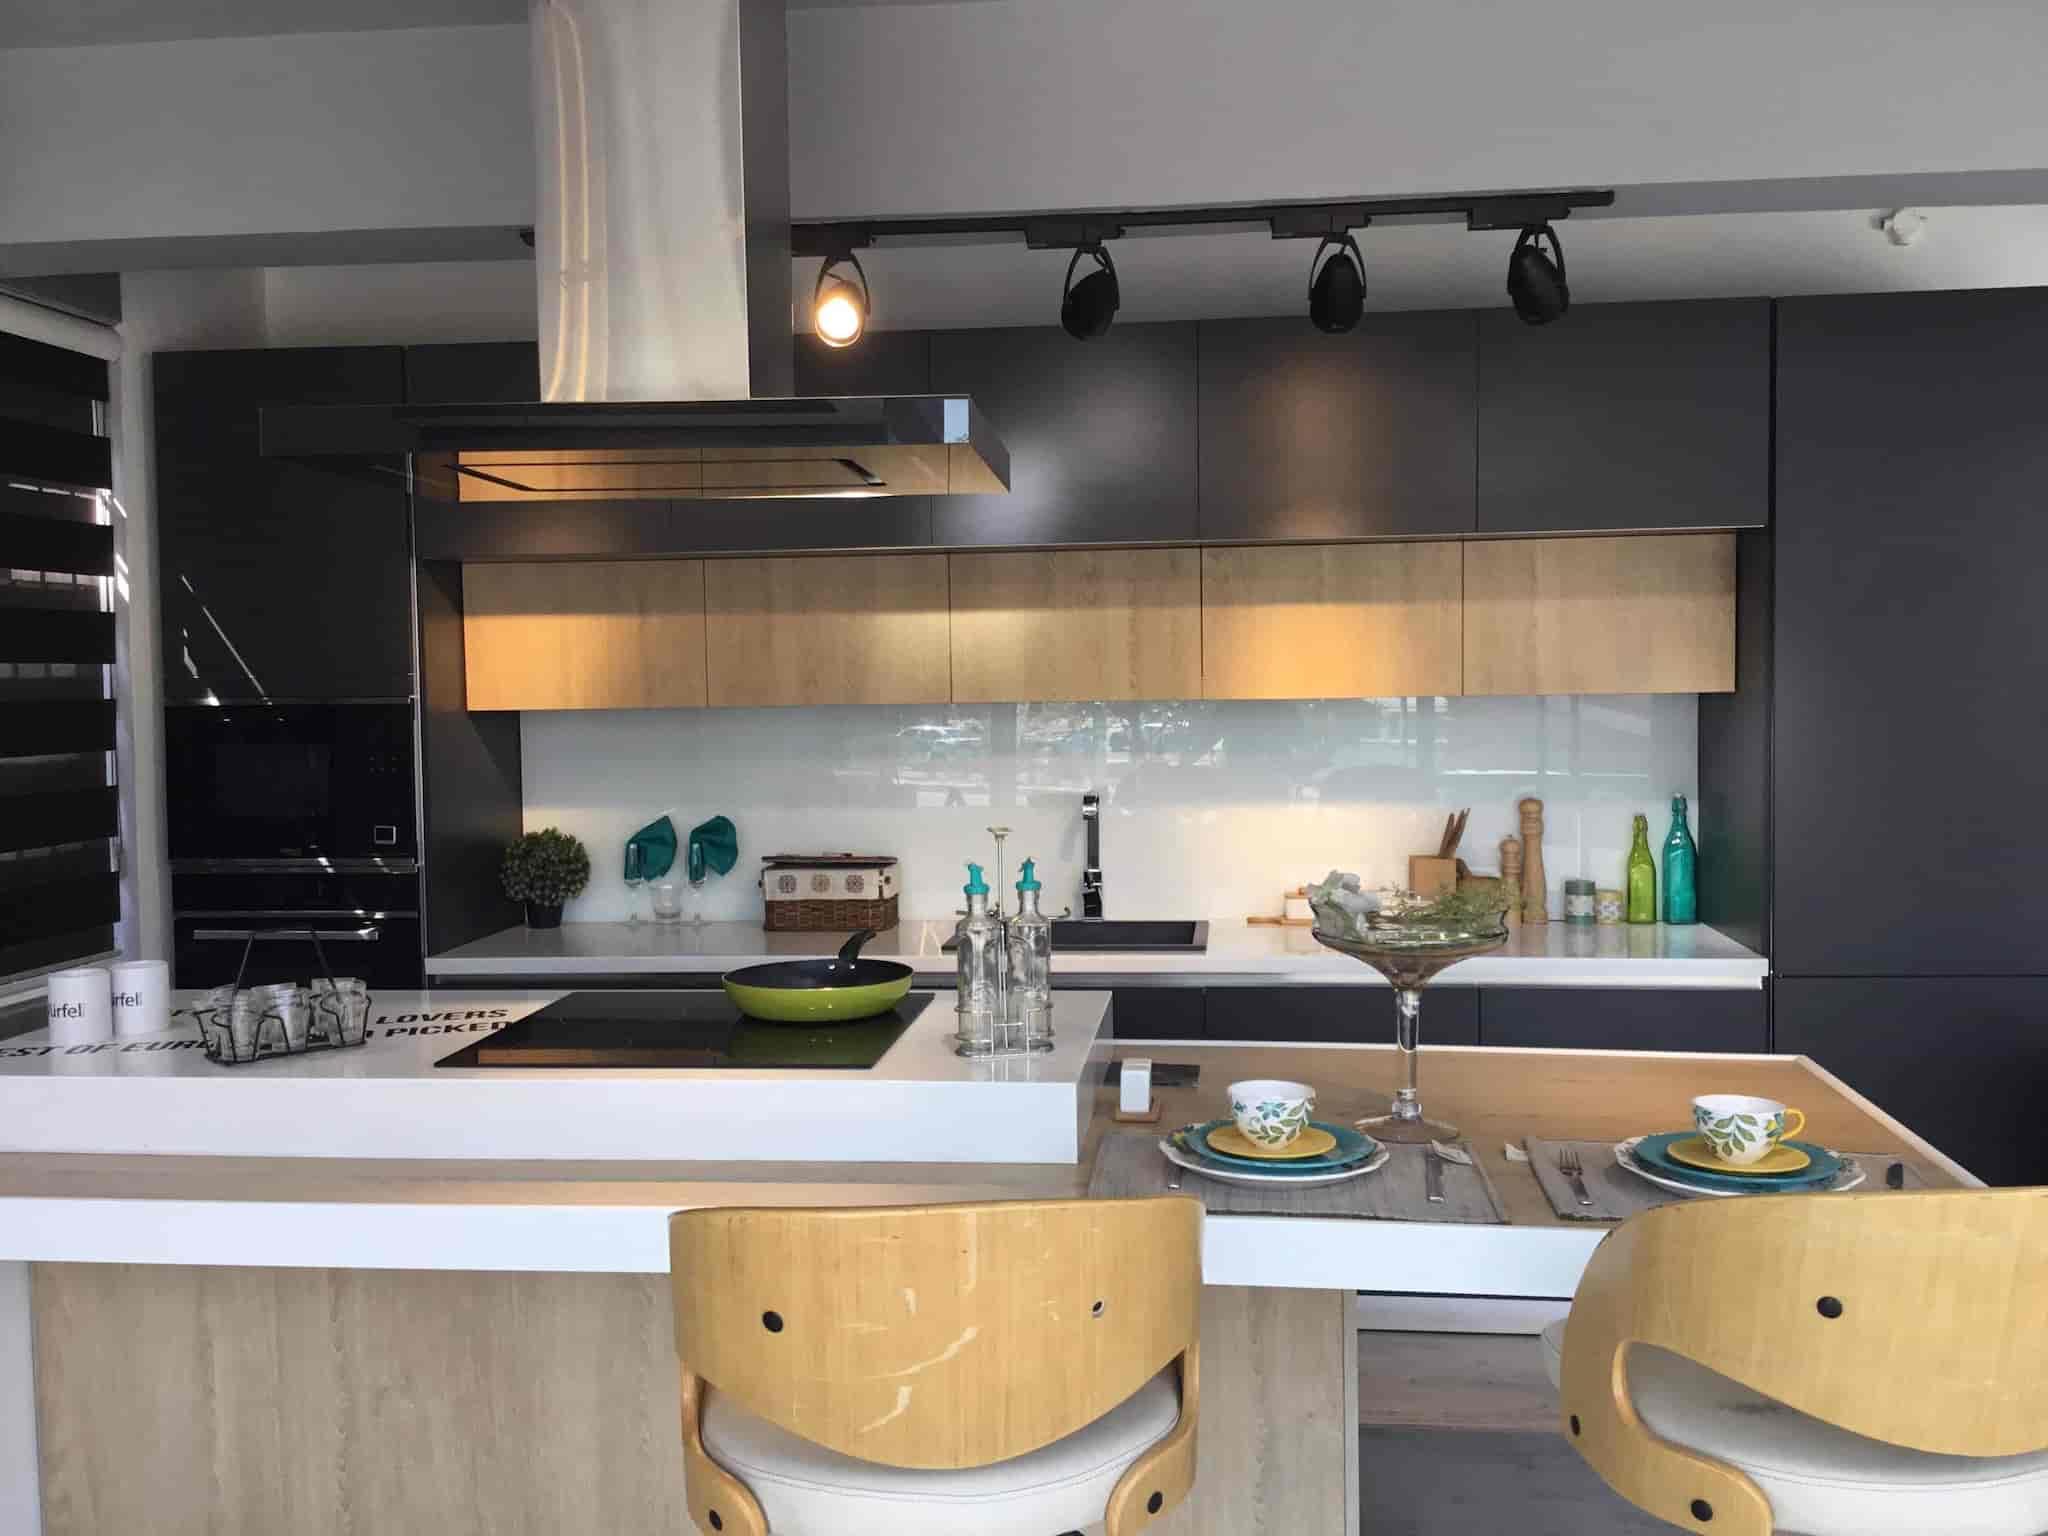 Großzügig Godrej Modulare Küche Preisliste Bangalore Fotos - Ideen ...